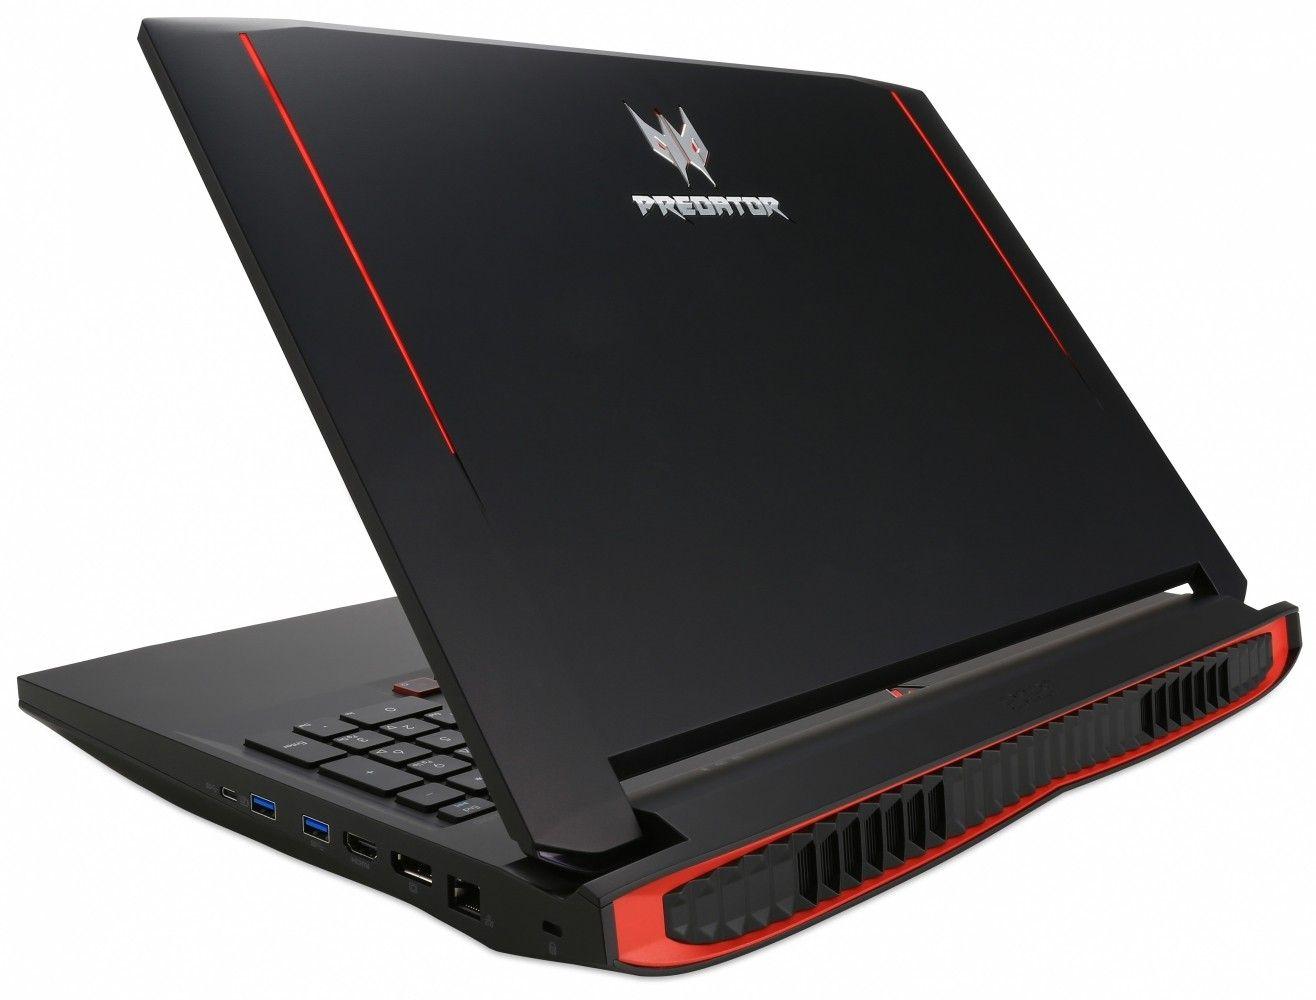 Ноутбук Acer Predator 15 G9-591-52PQ (NX.Q07EU.008) - 5